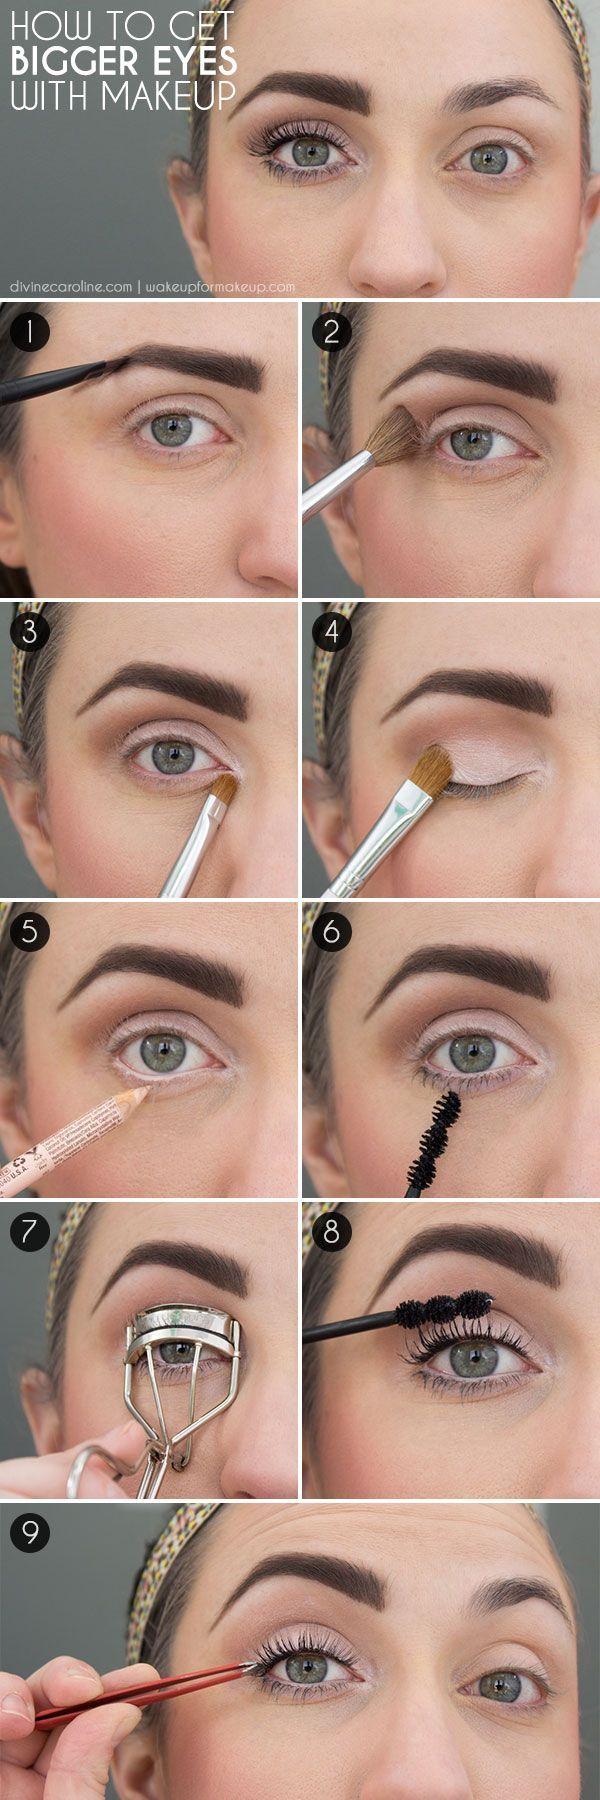 Makeup Tutorial for Bigger Looking Eyes